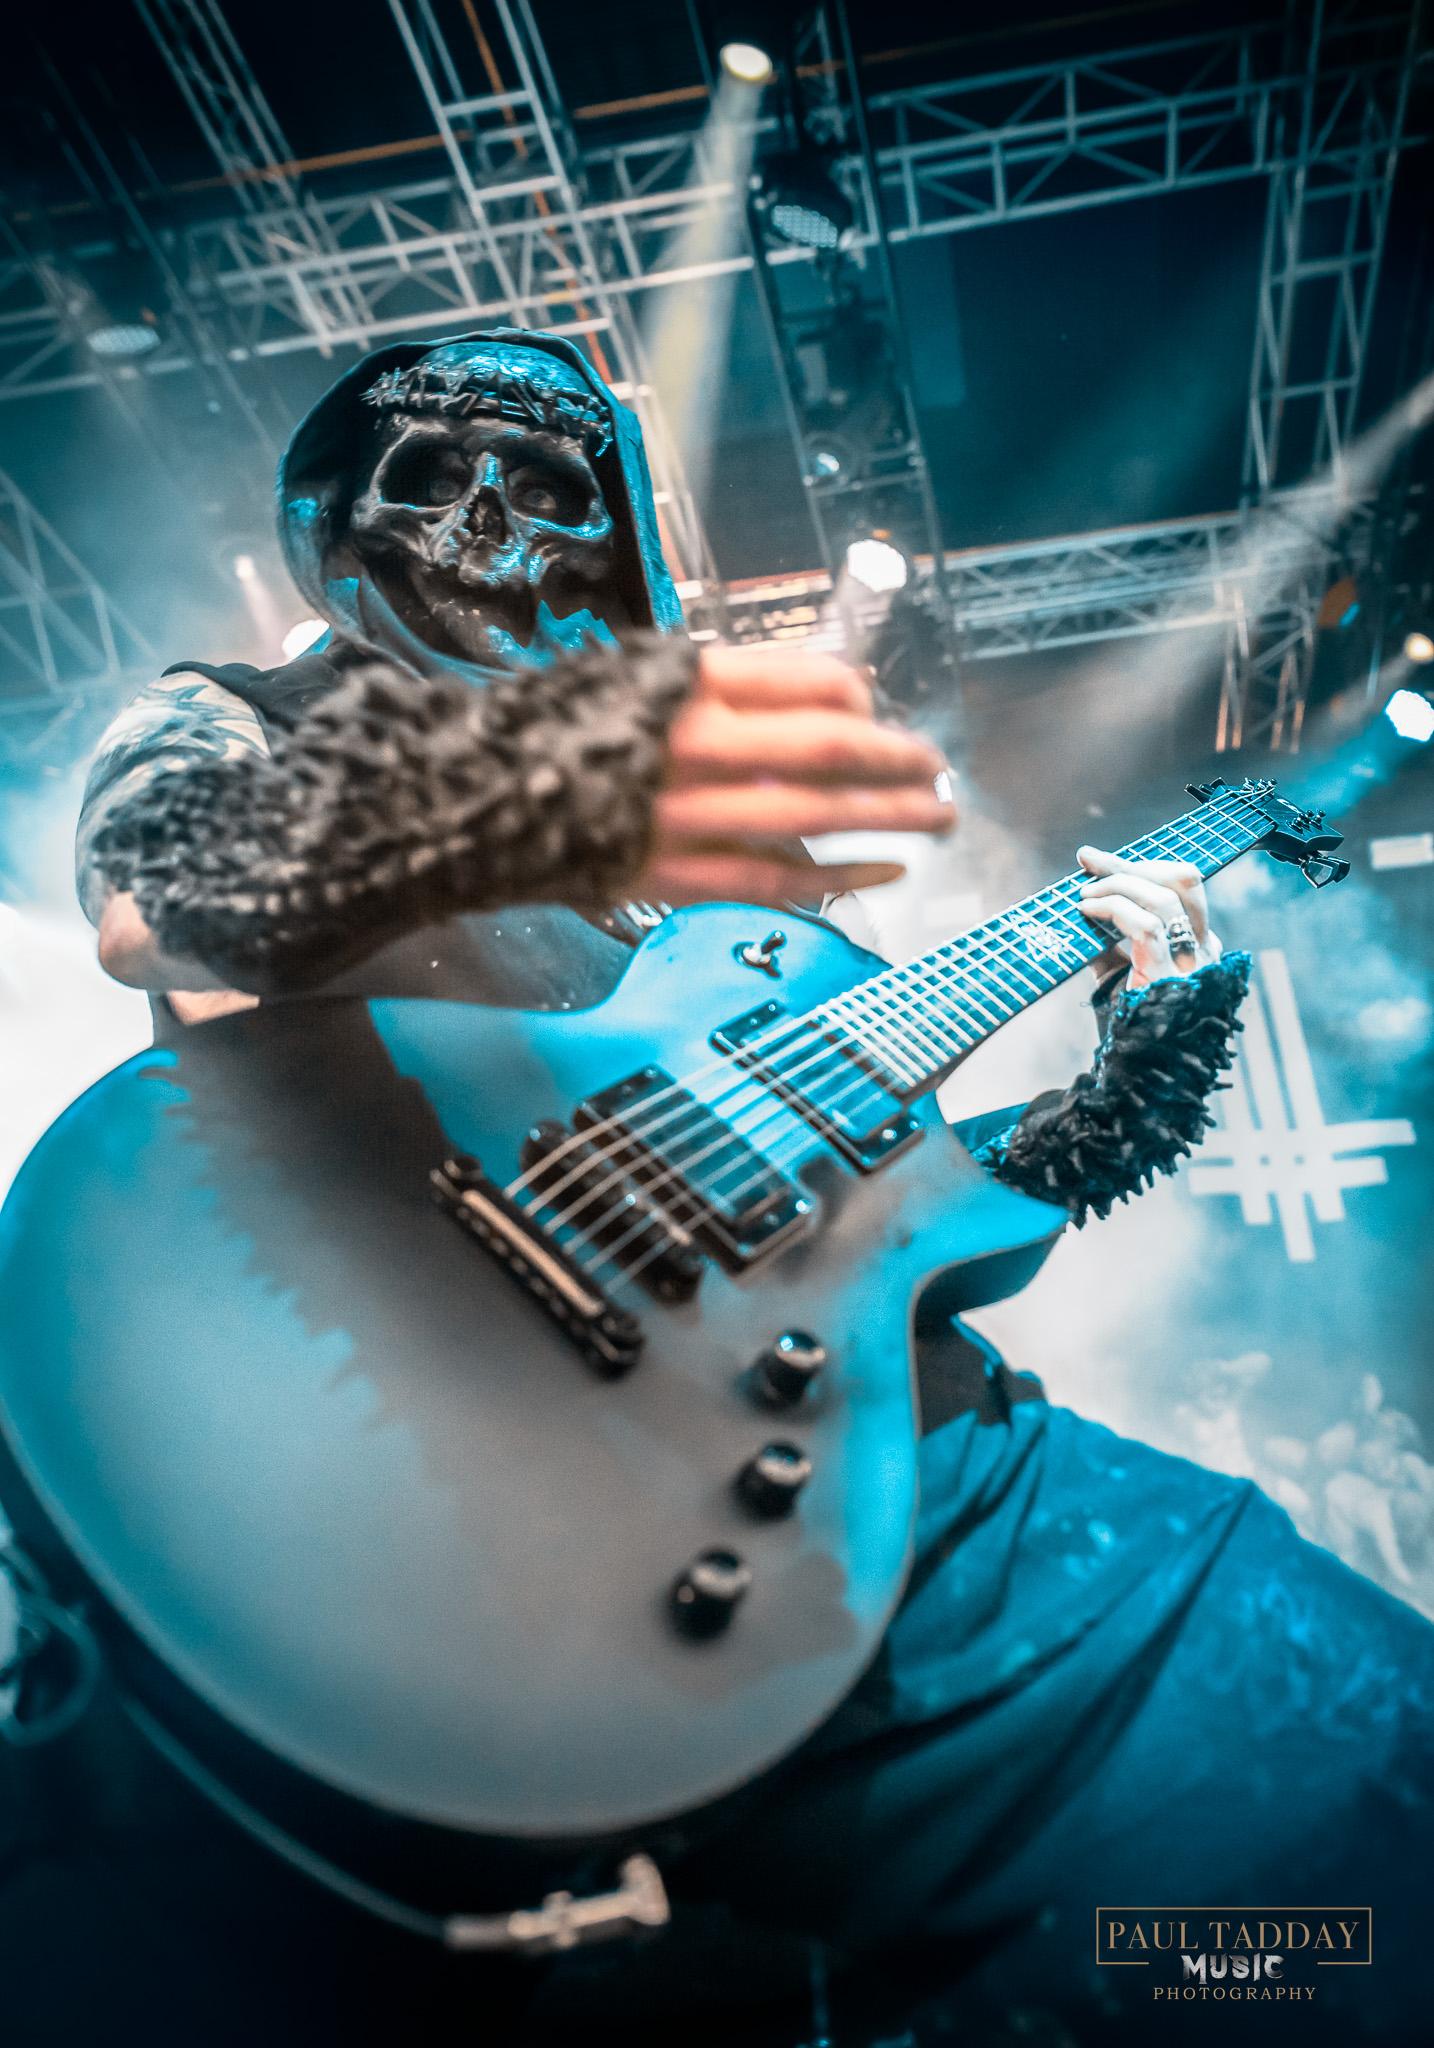 behemoth - brisbane - march 7 2019 - web - paul tadday photography - 22.jpg